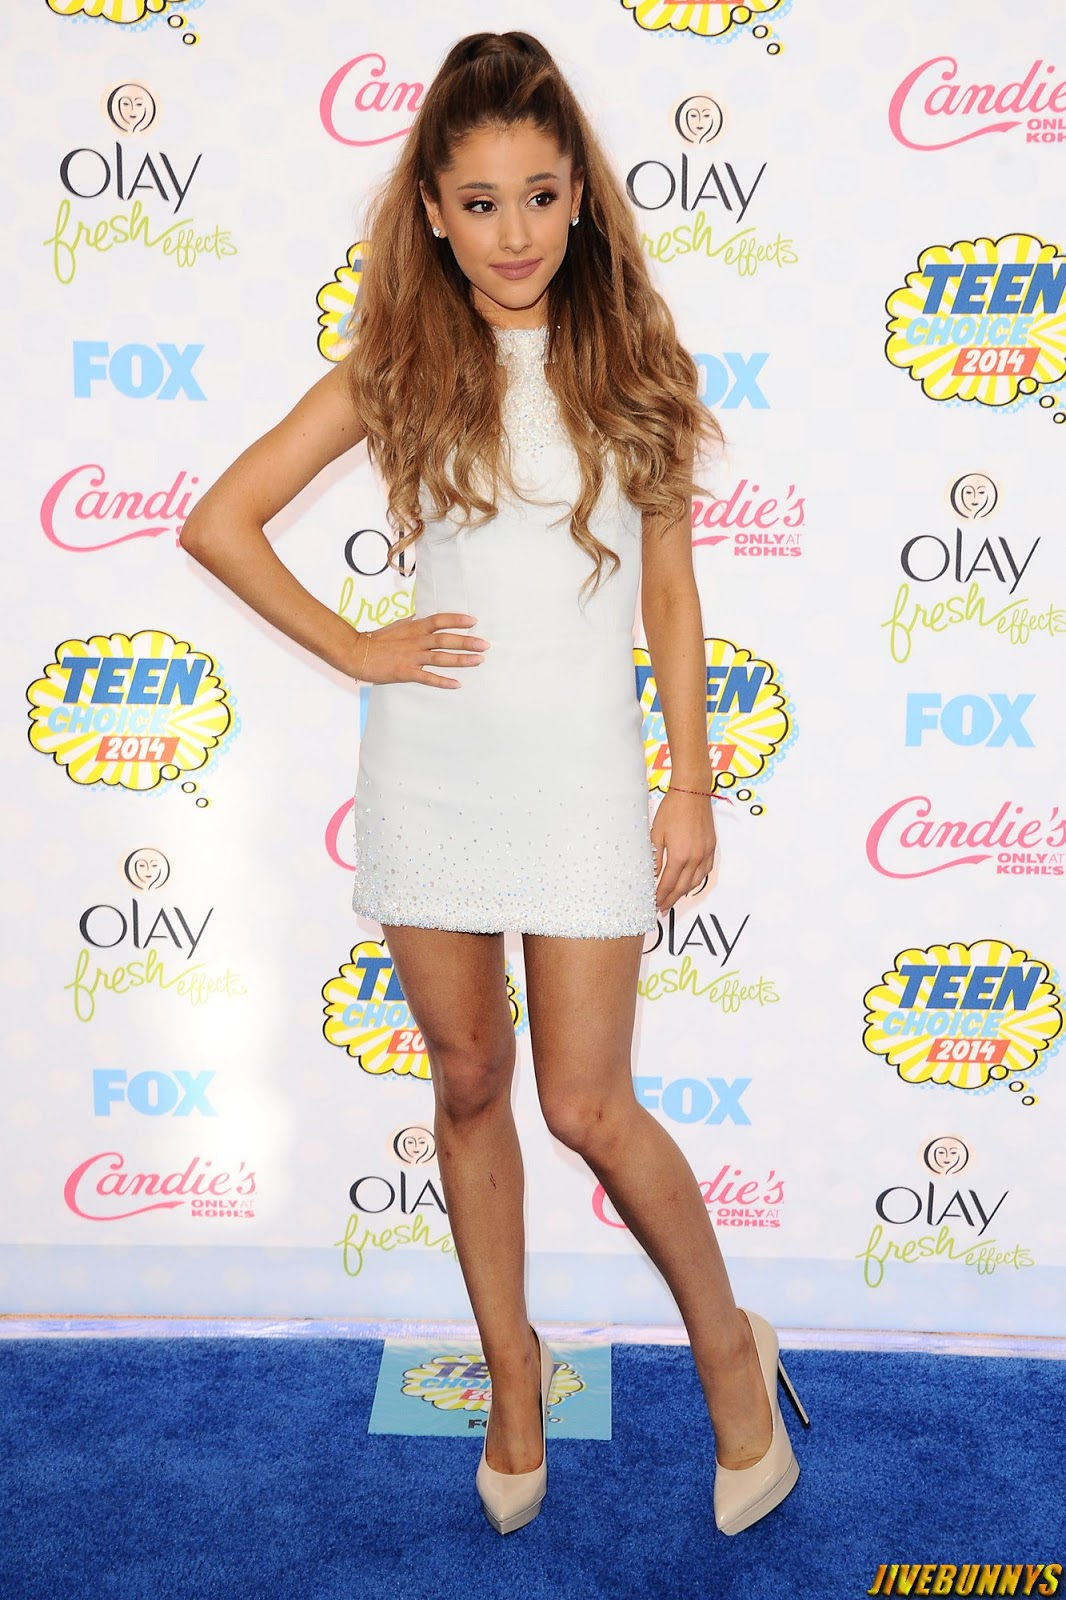 2014 Teen Choice Awards in LA 8/10/2014